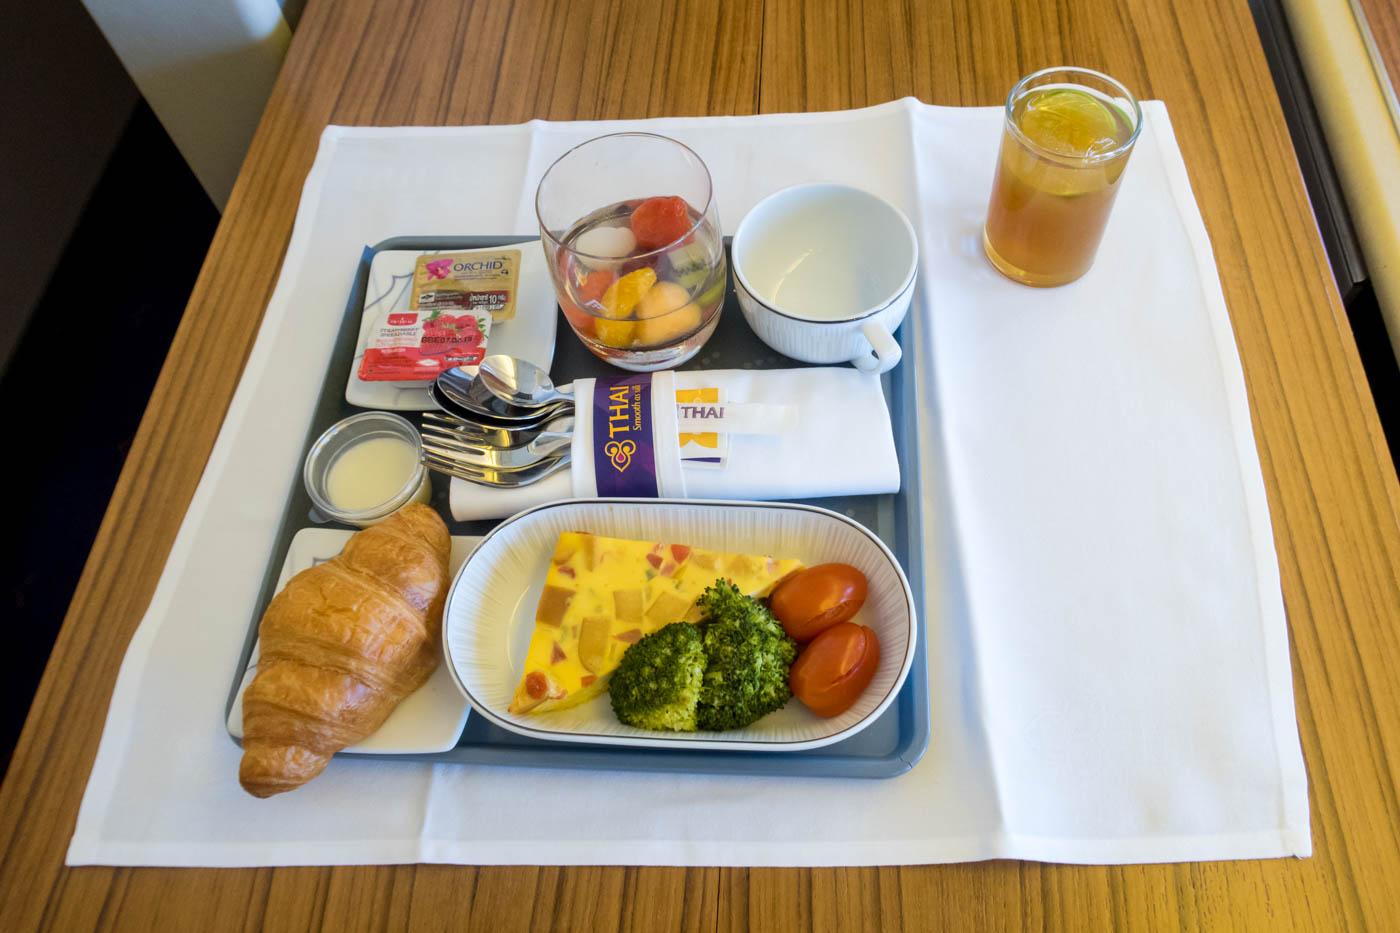 Thai Airways Domestic Business Class Breakfast